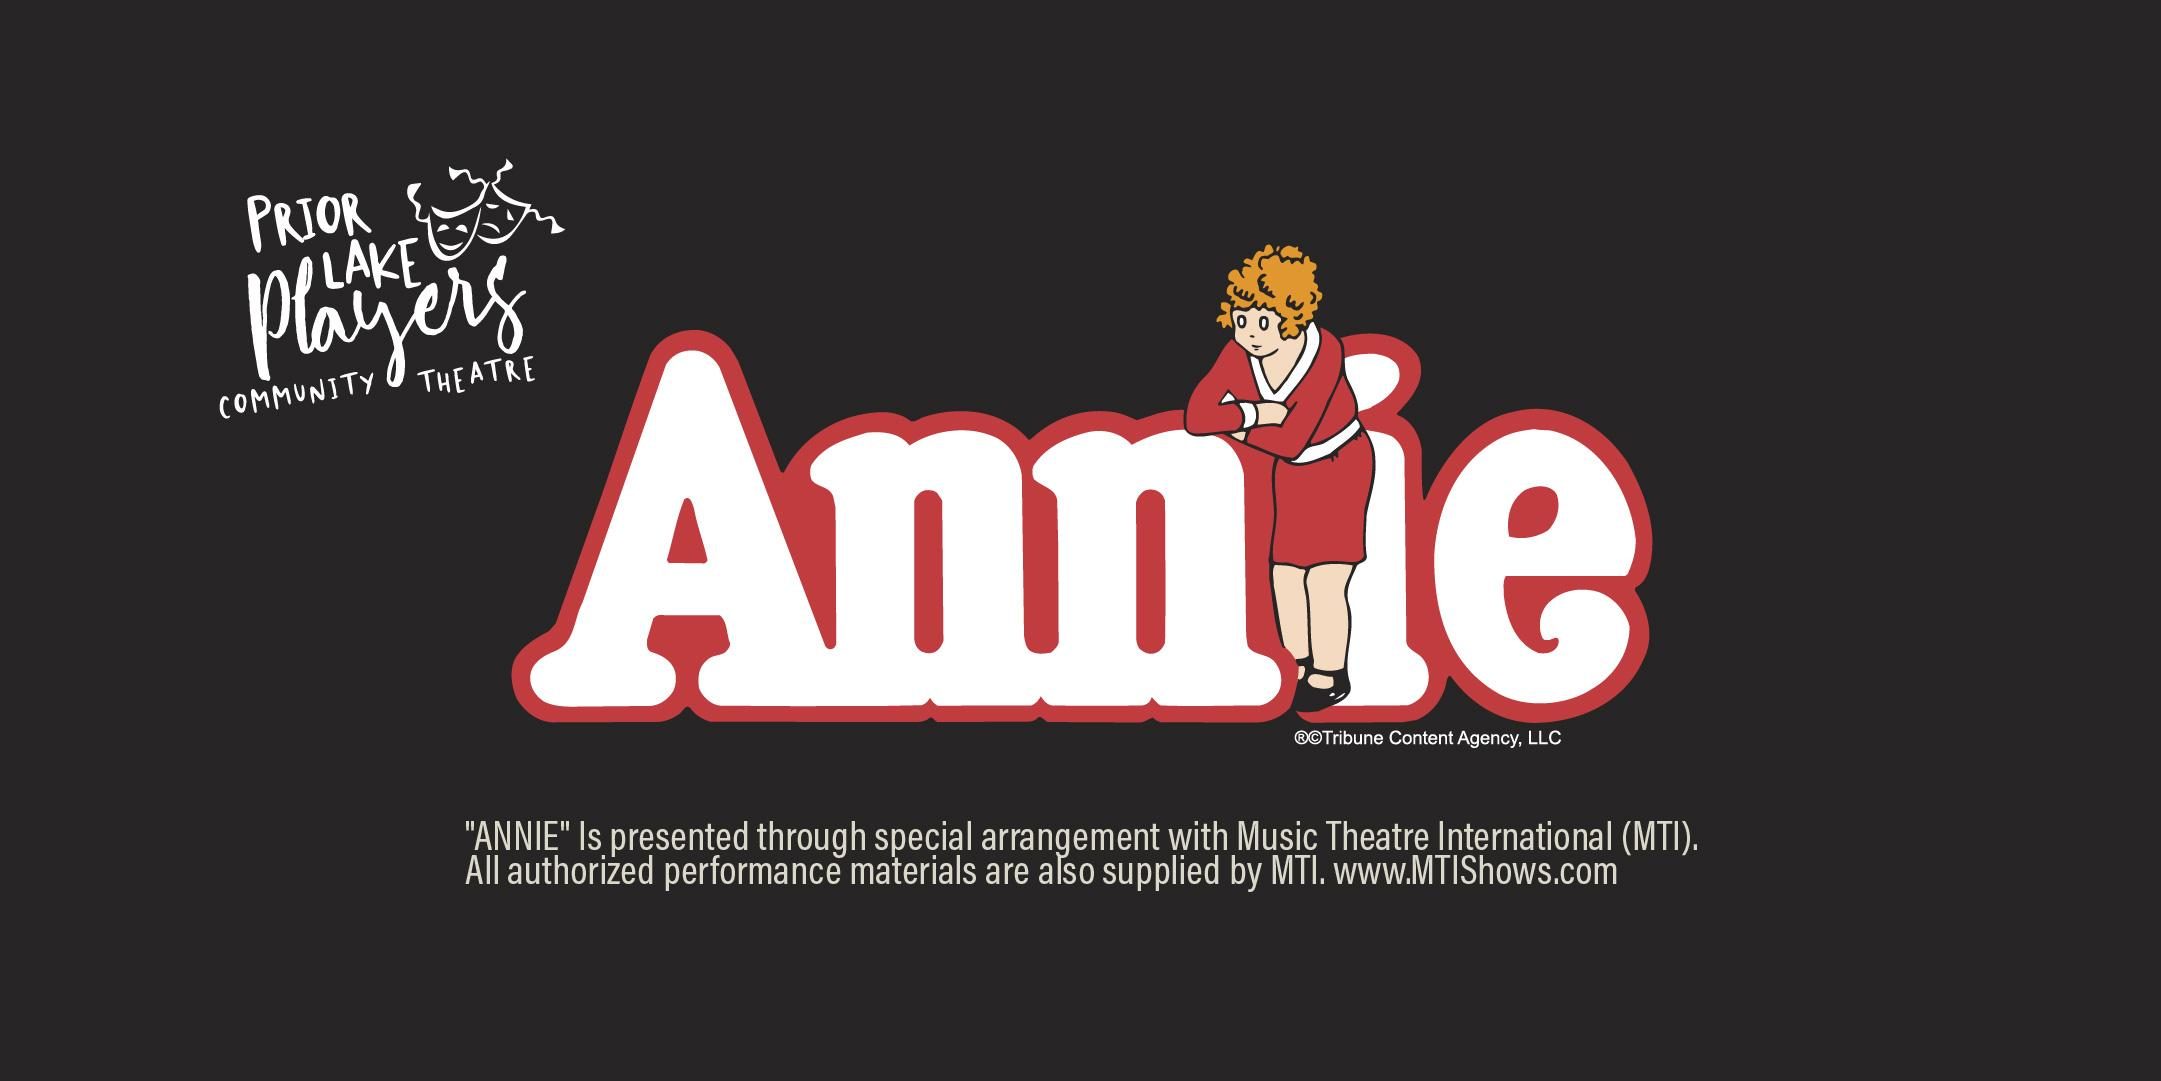 """Annie"" | Prior Lake Players Community Theatr"